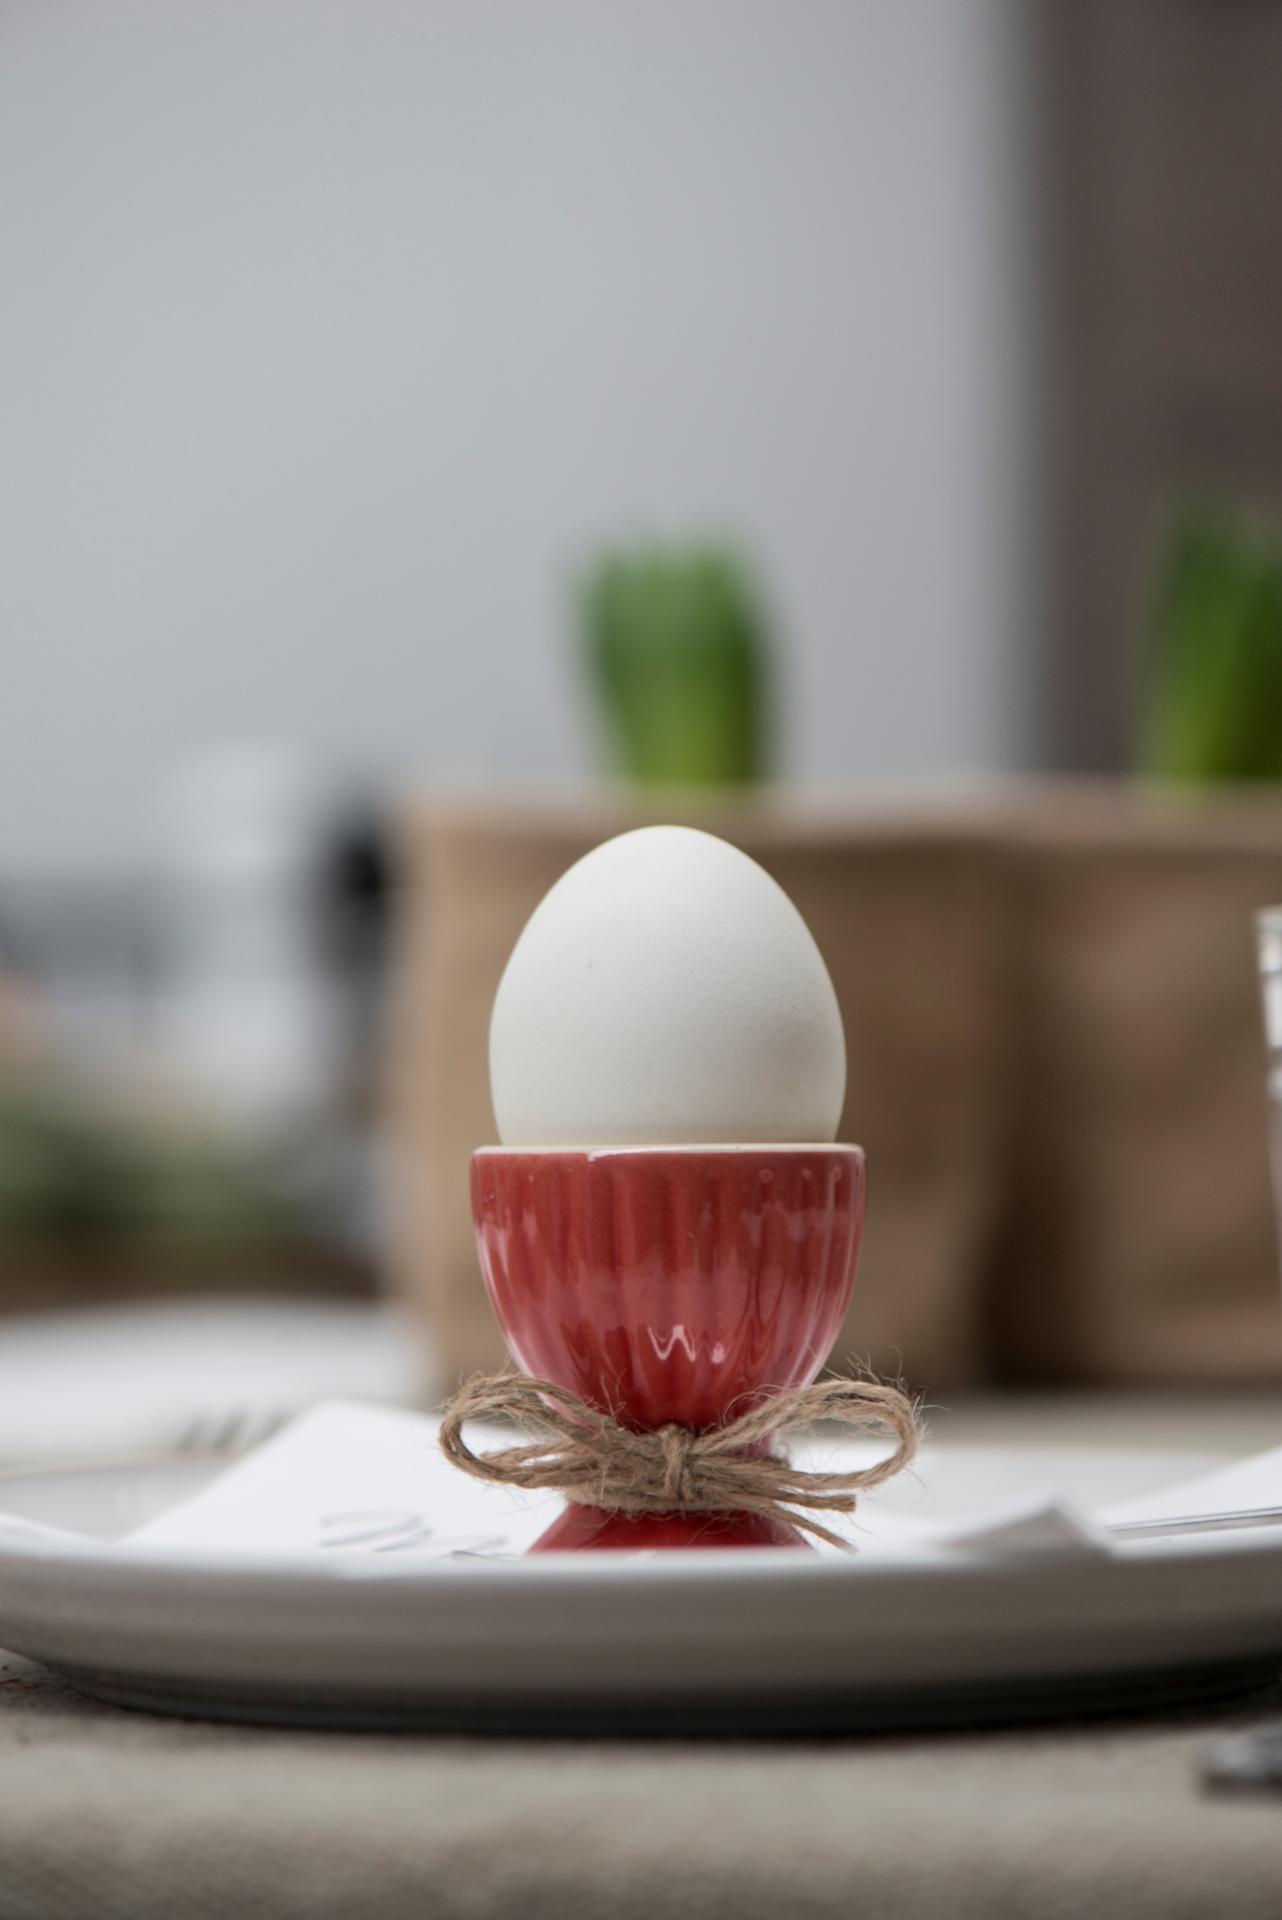 IB LAURSEN Stojánek na vejce Mynte red, červená barva, keramika